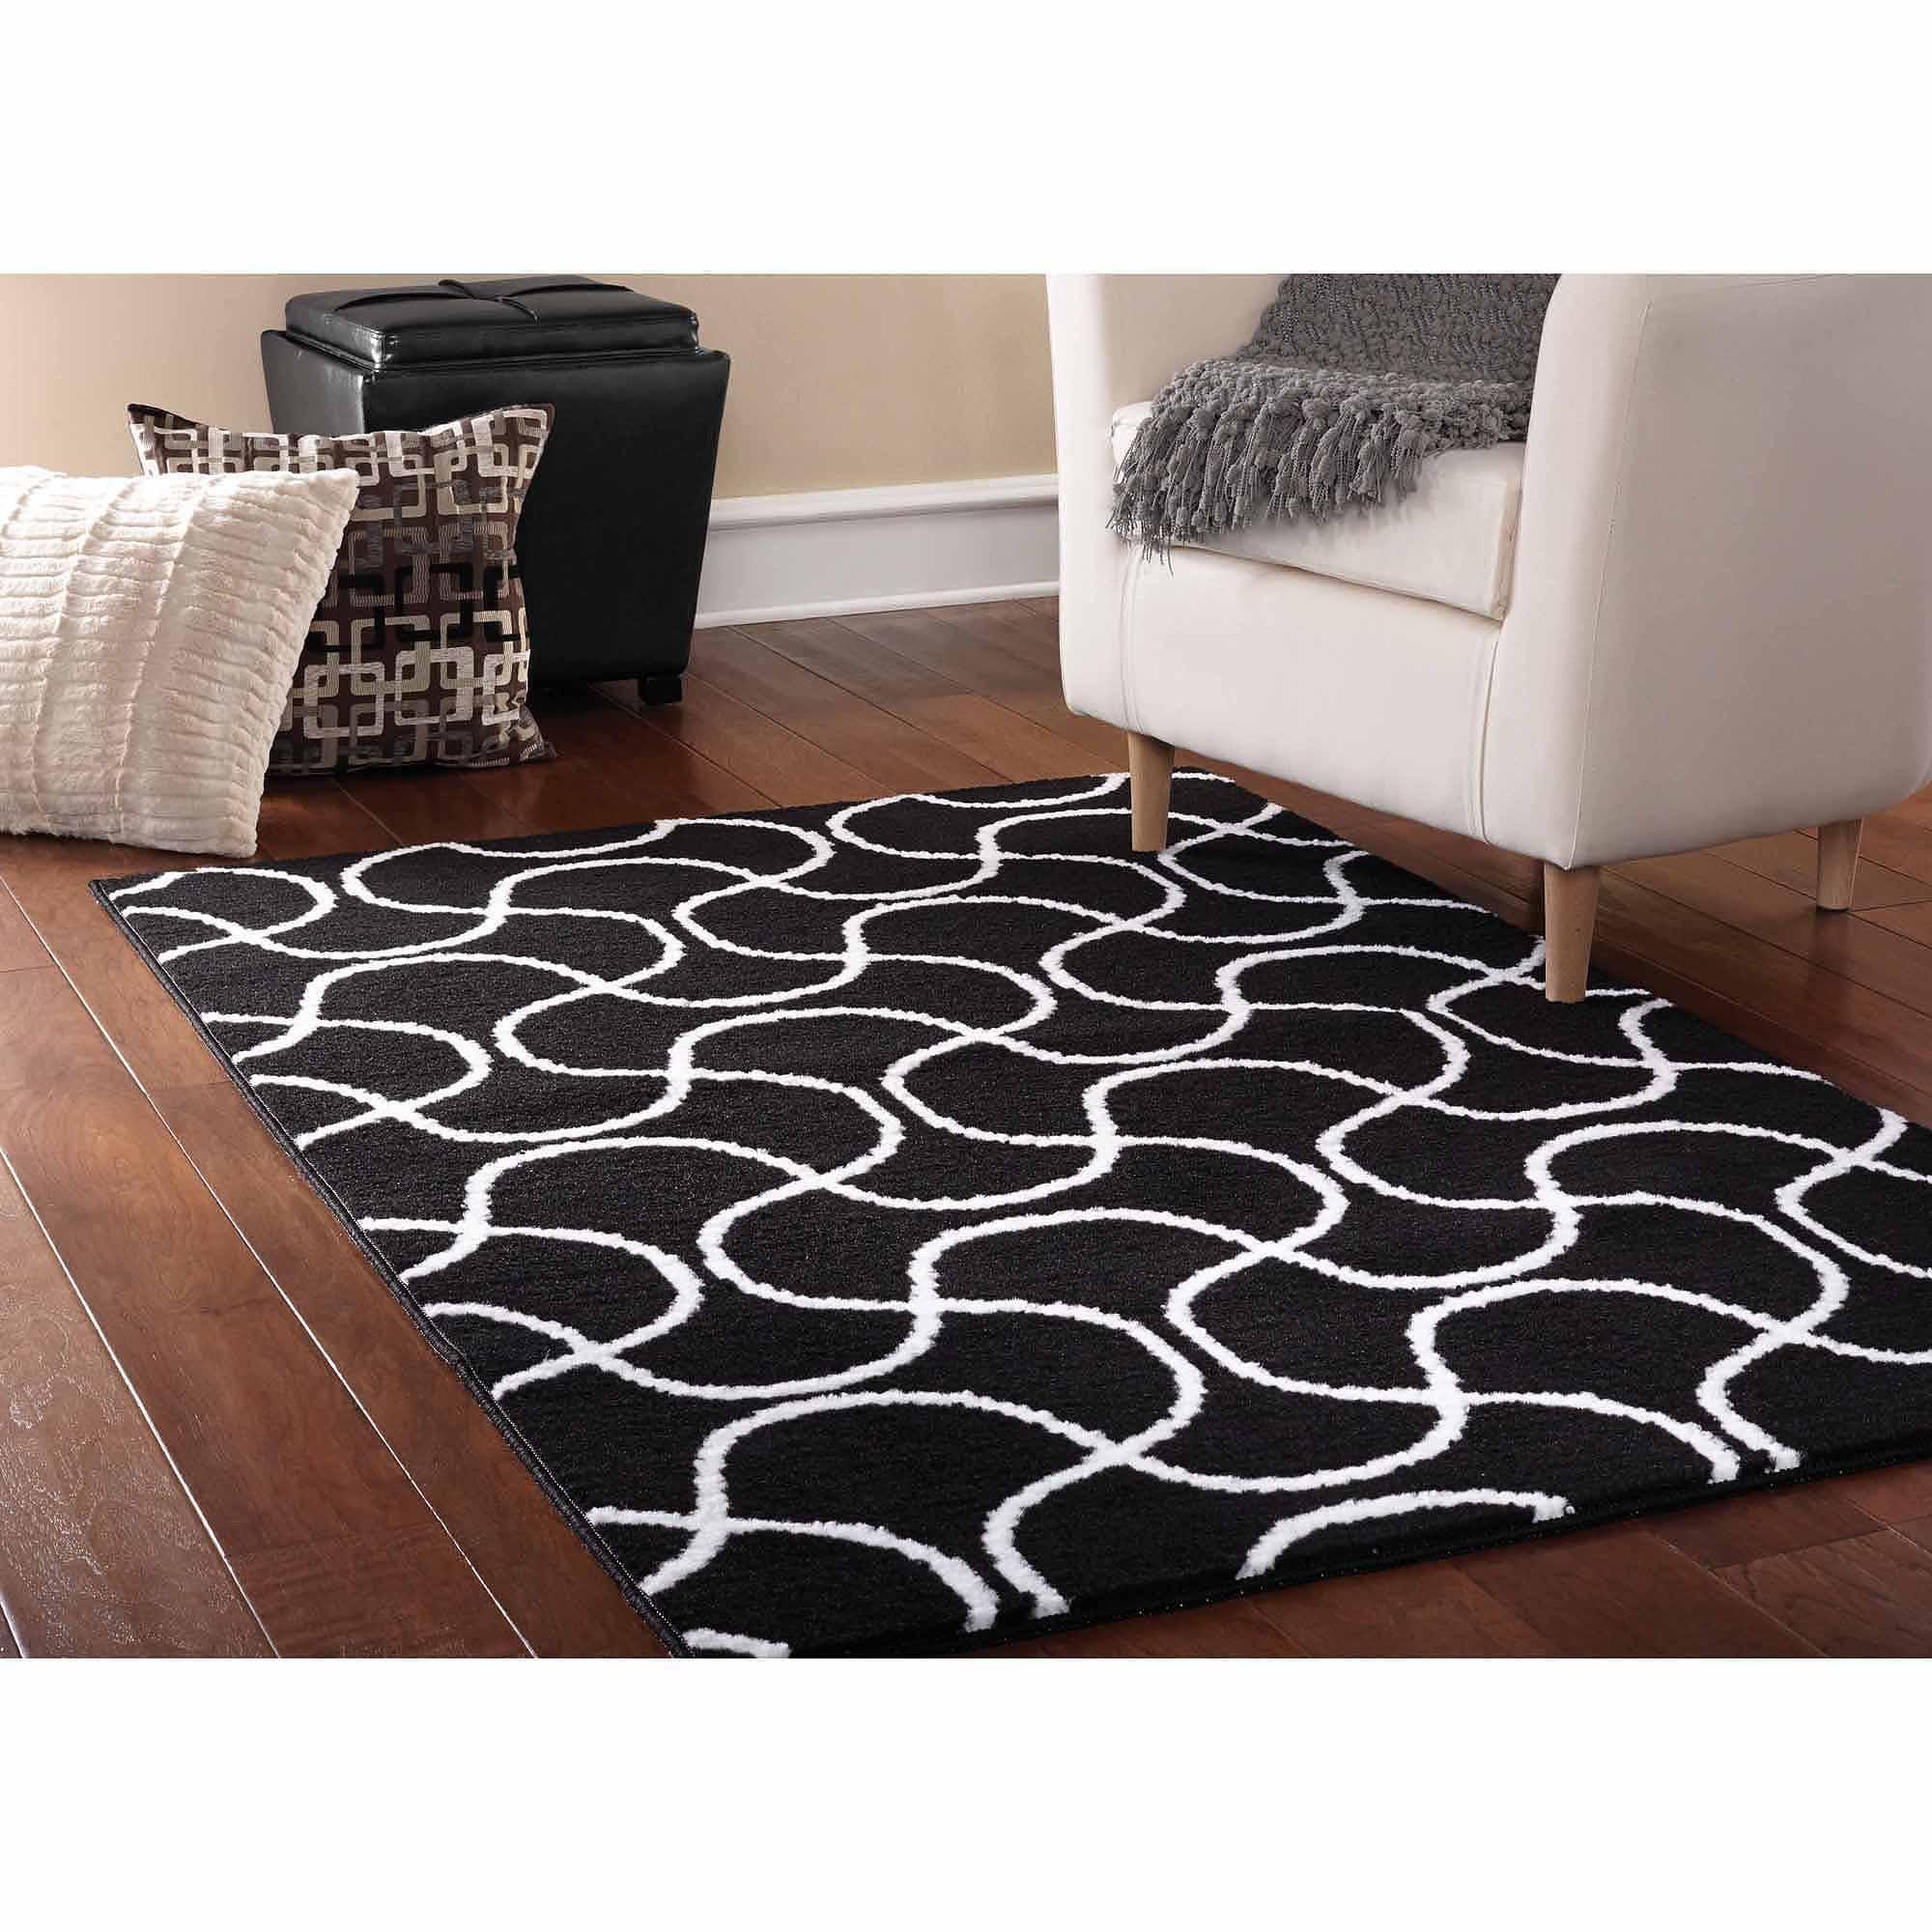 modern black area rug modern white area rug. modern white area rug k RKZXNKP